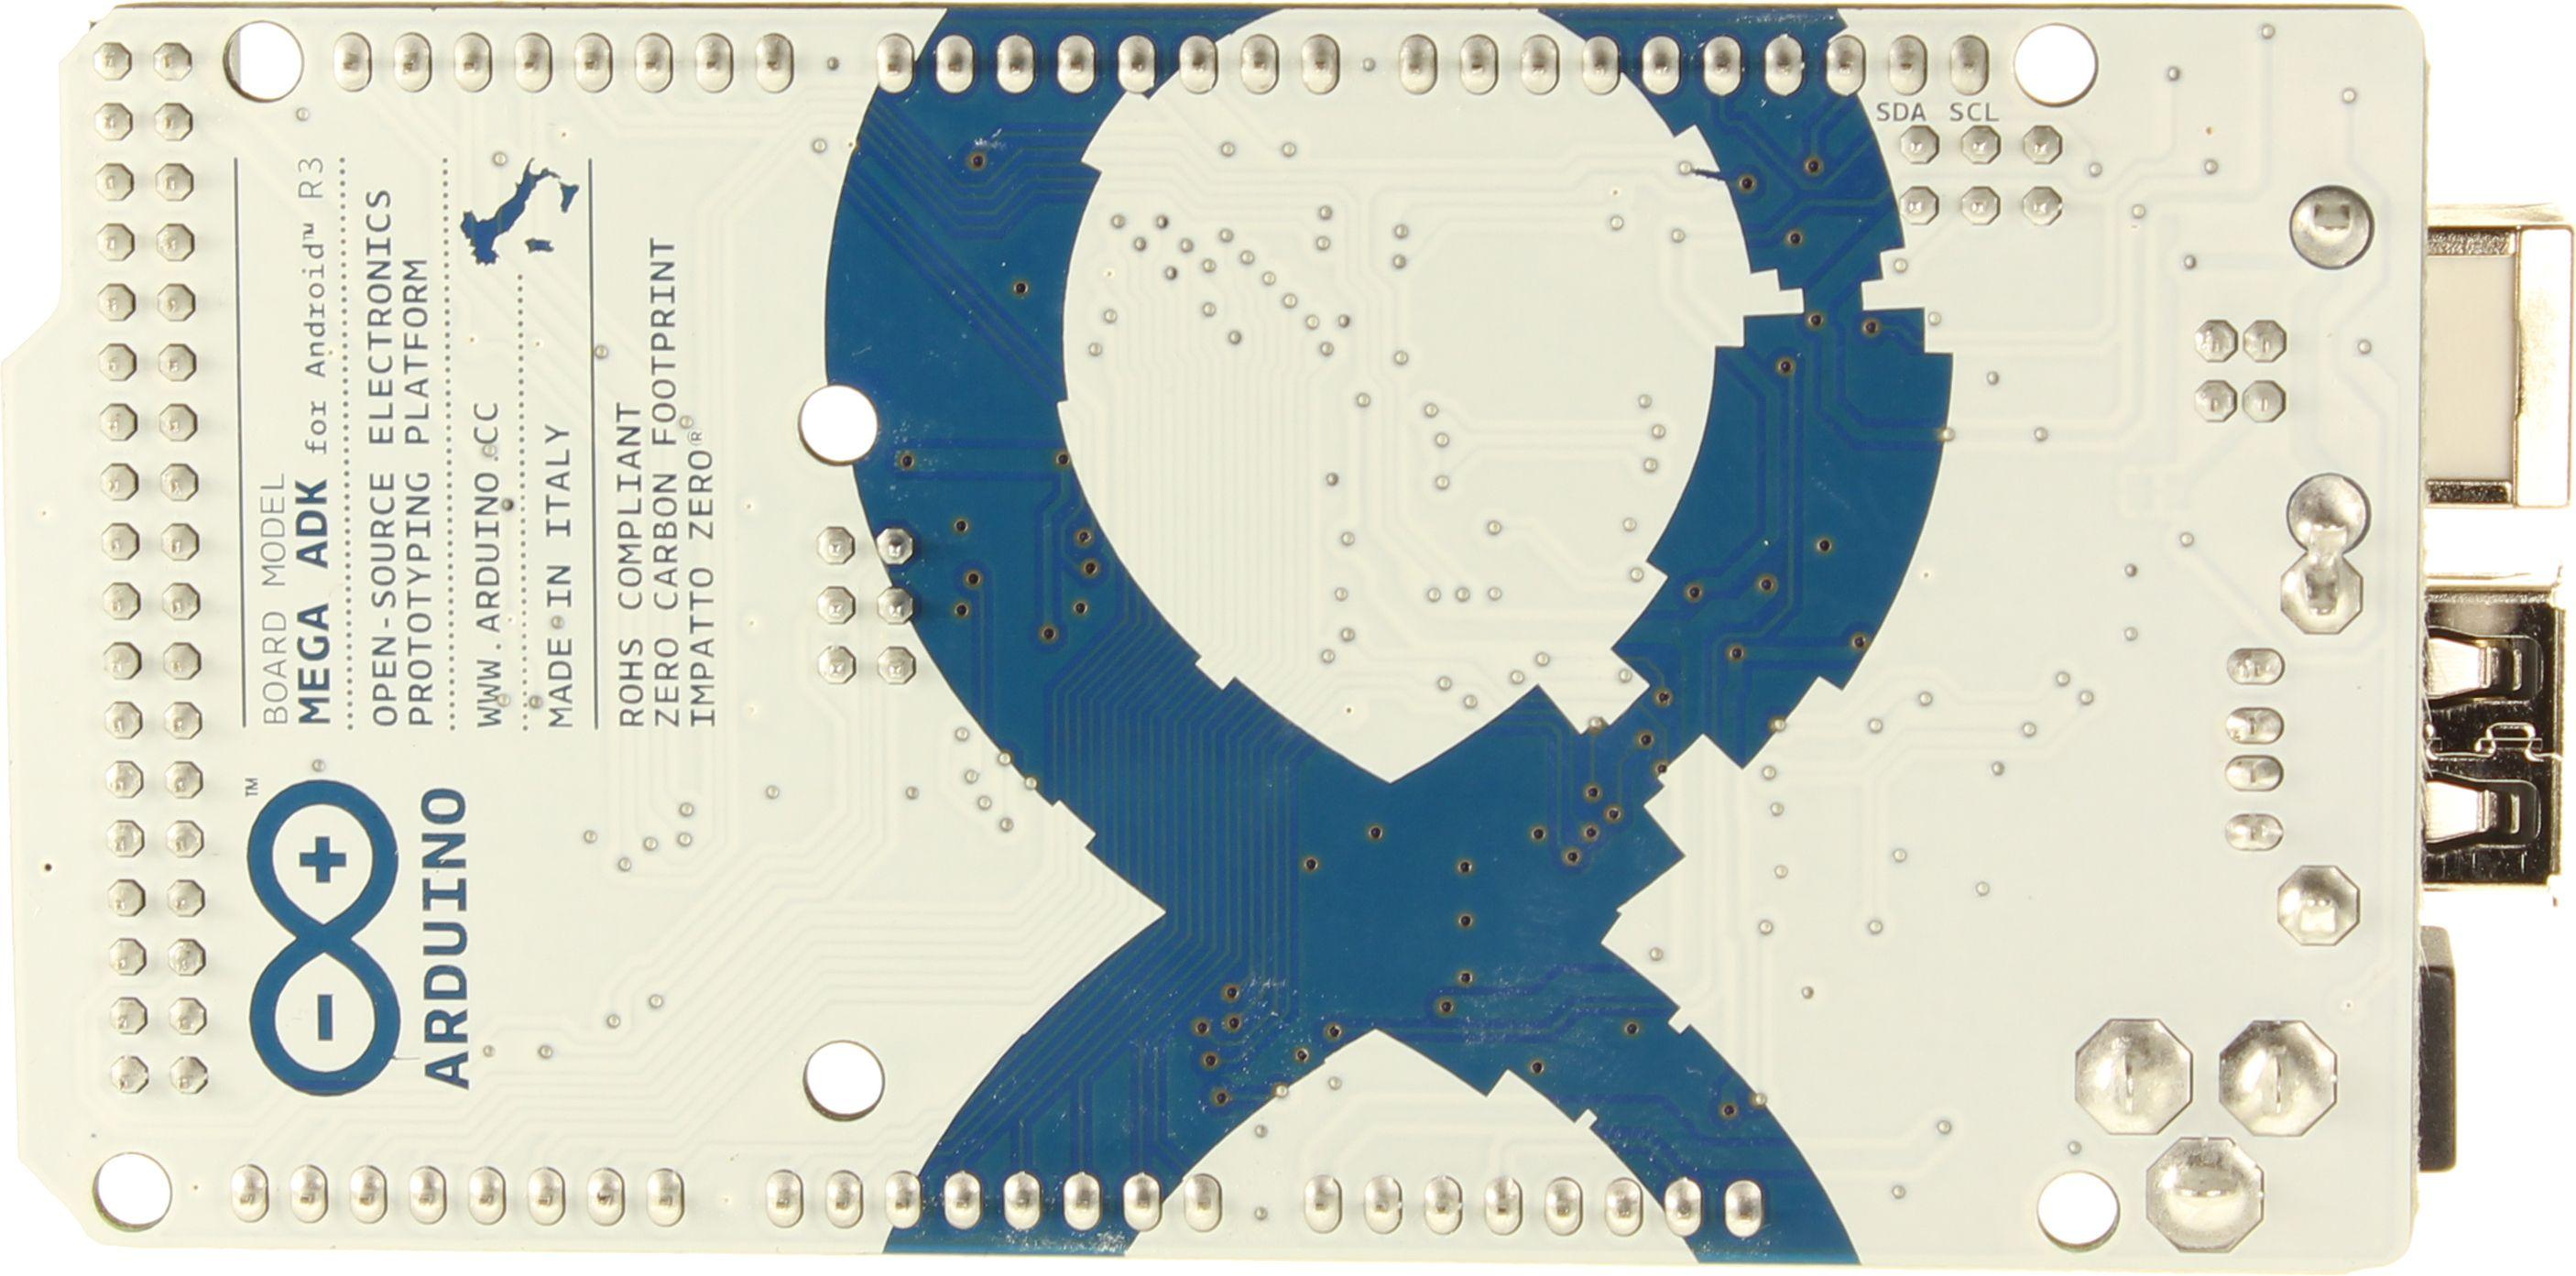 Arduino Mega Adk For Android Arduino Arduino Board Arduino